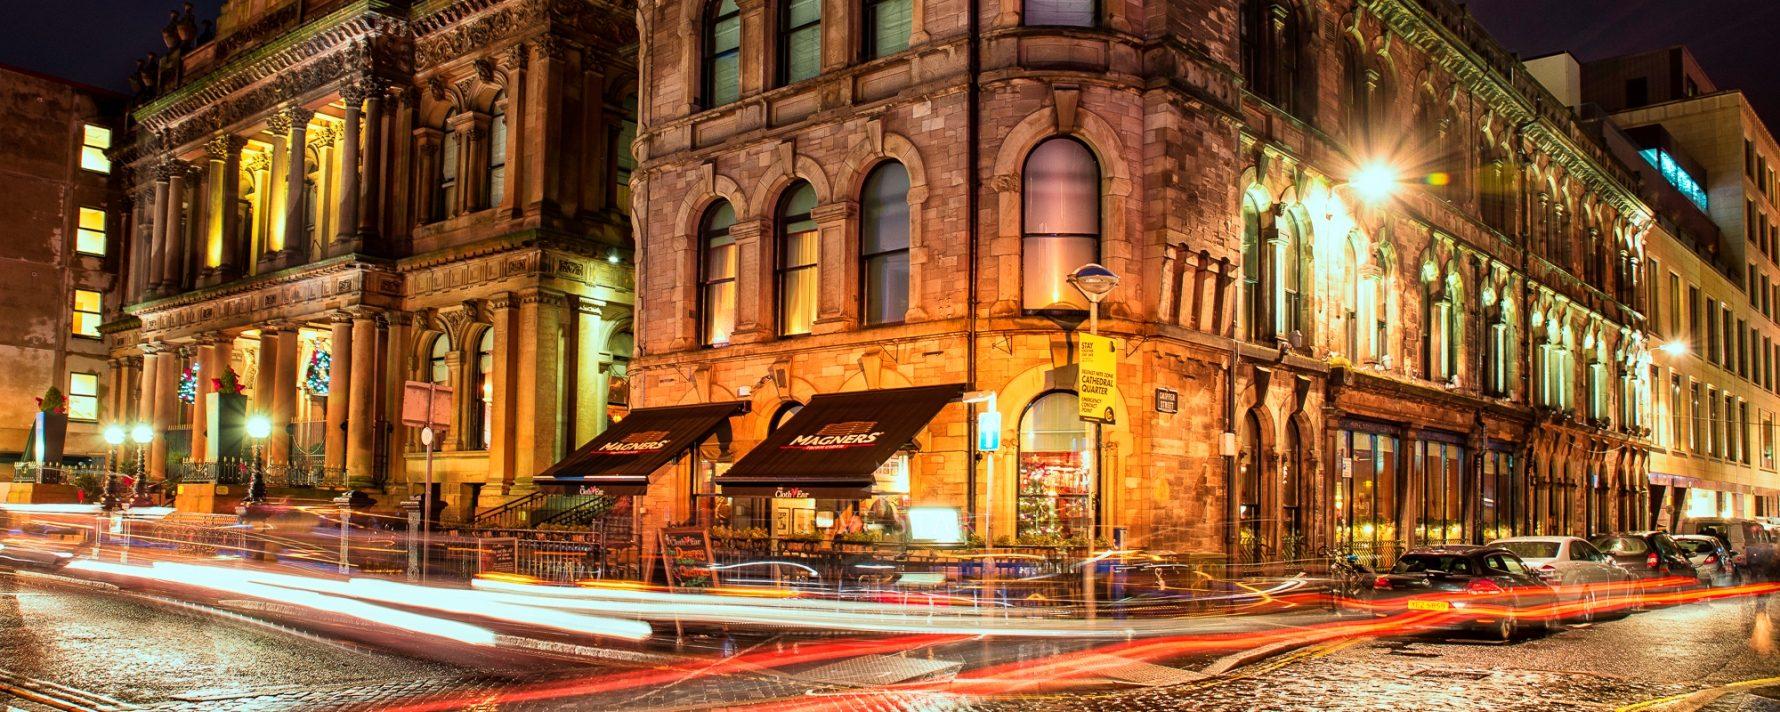 The Merchant Hotel photo 1